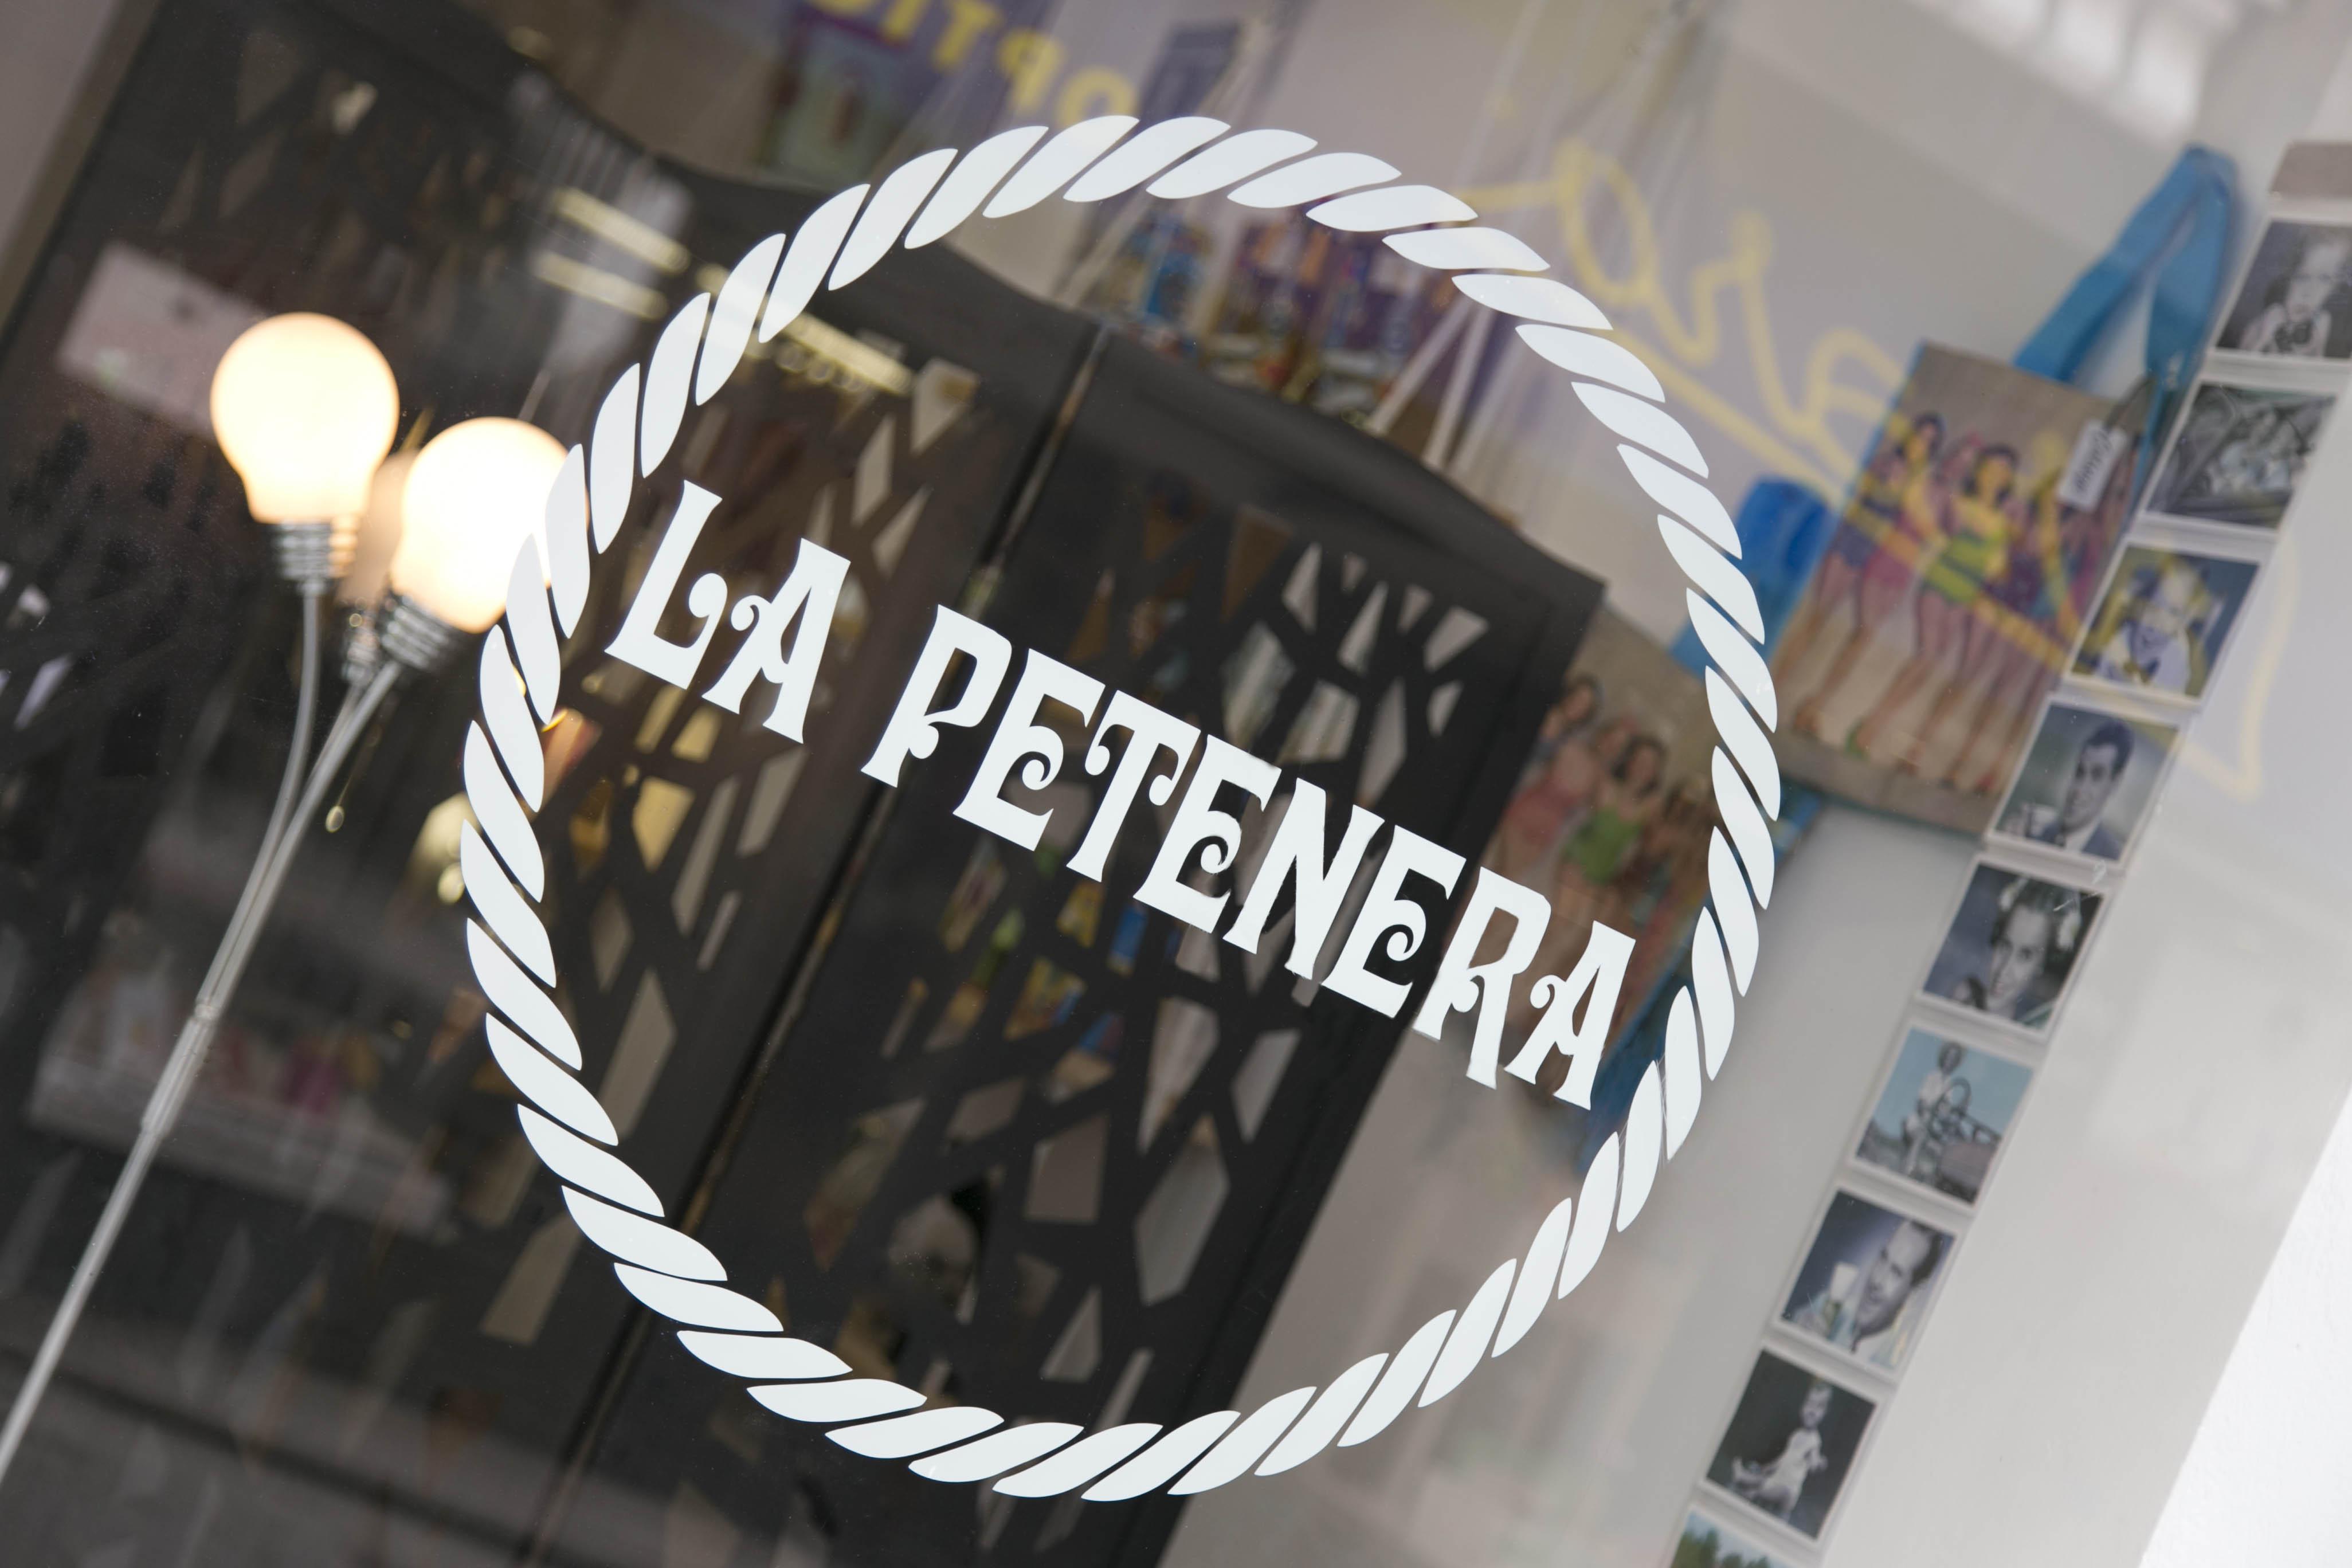 la_petenera_coruña_rocks